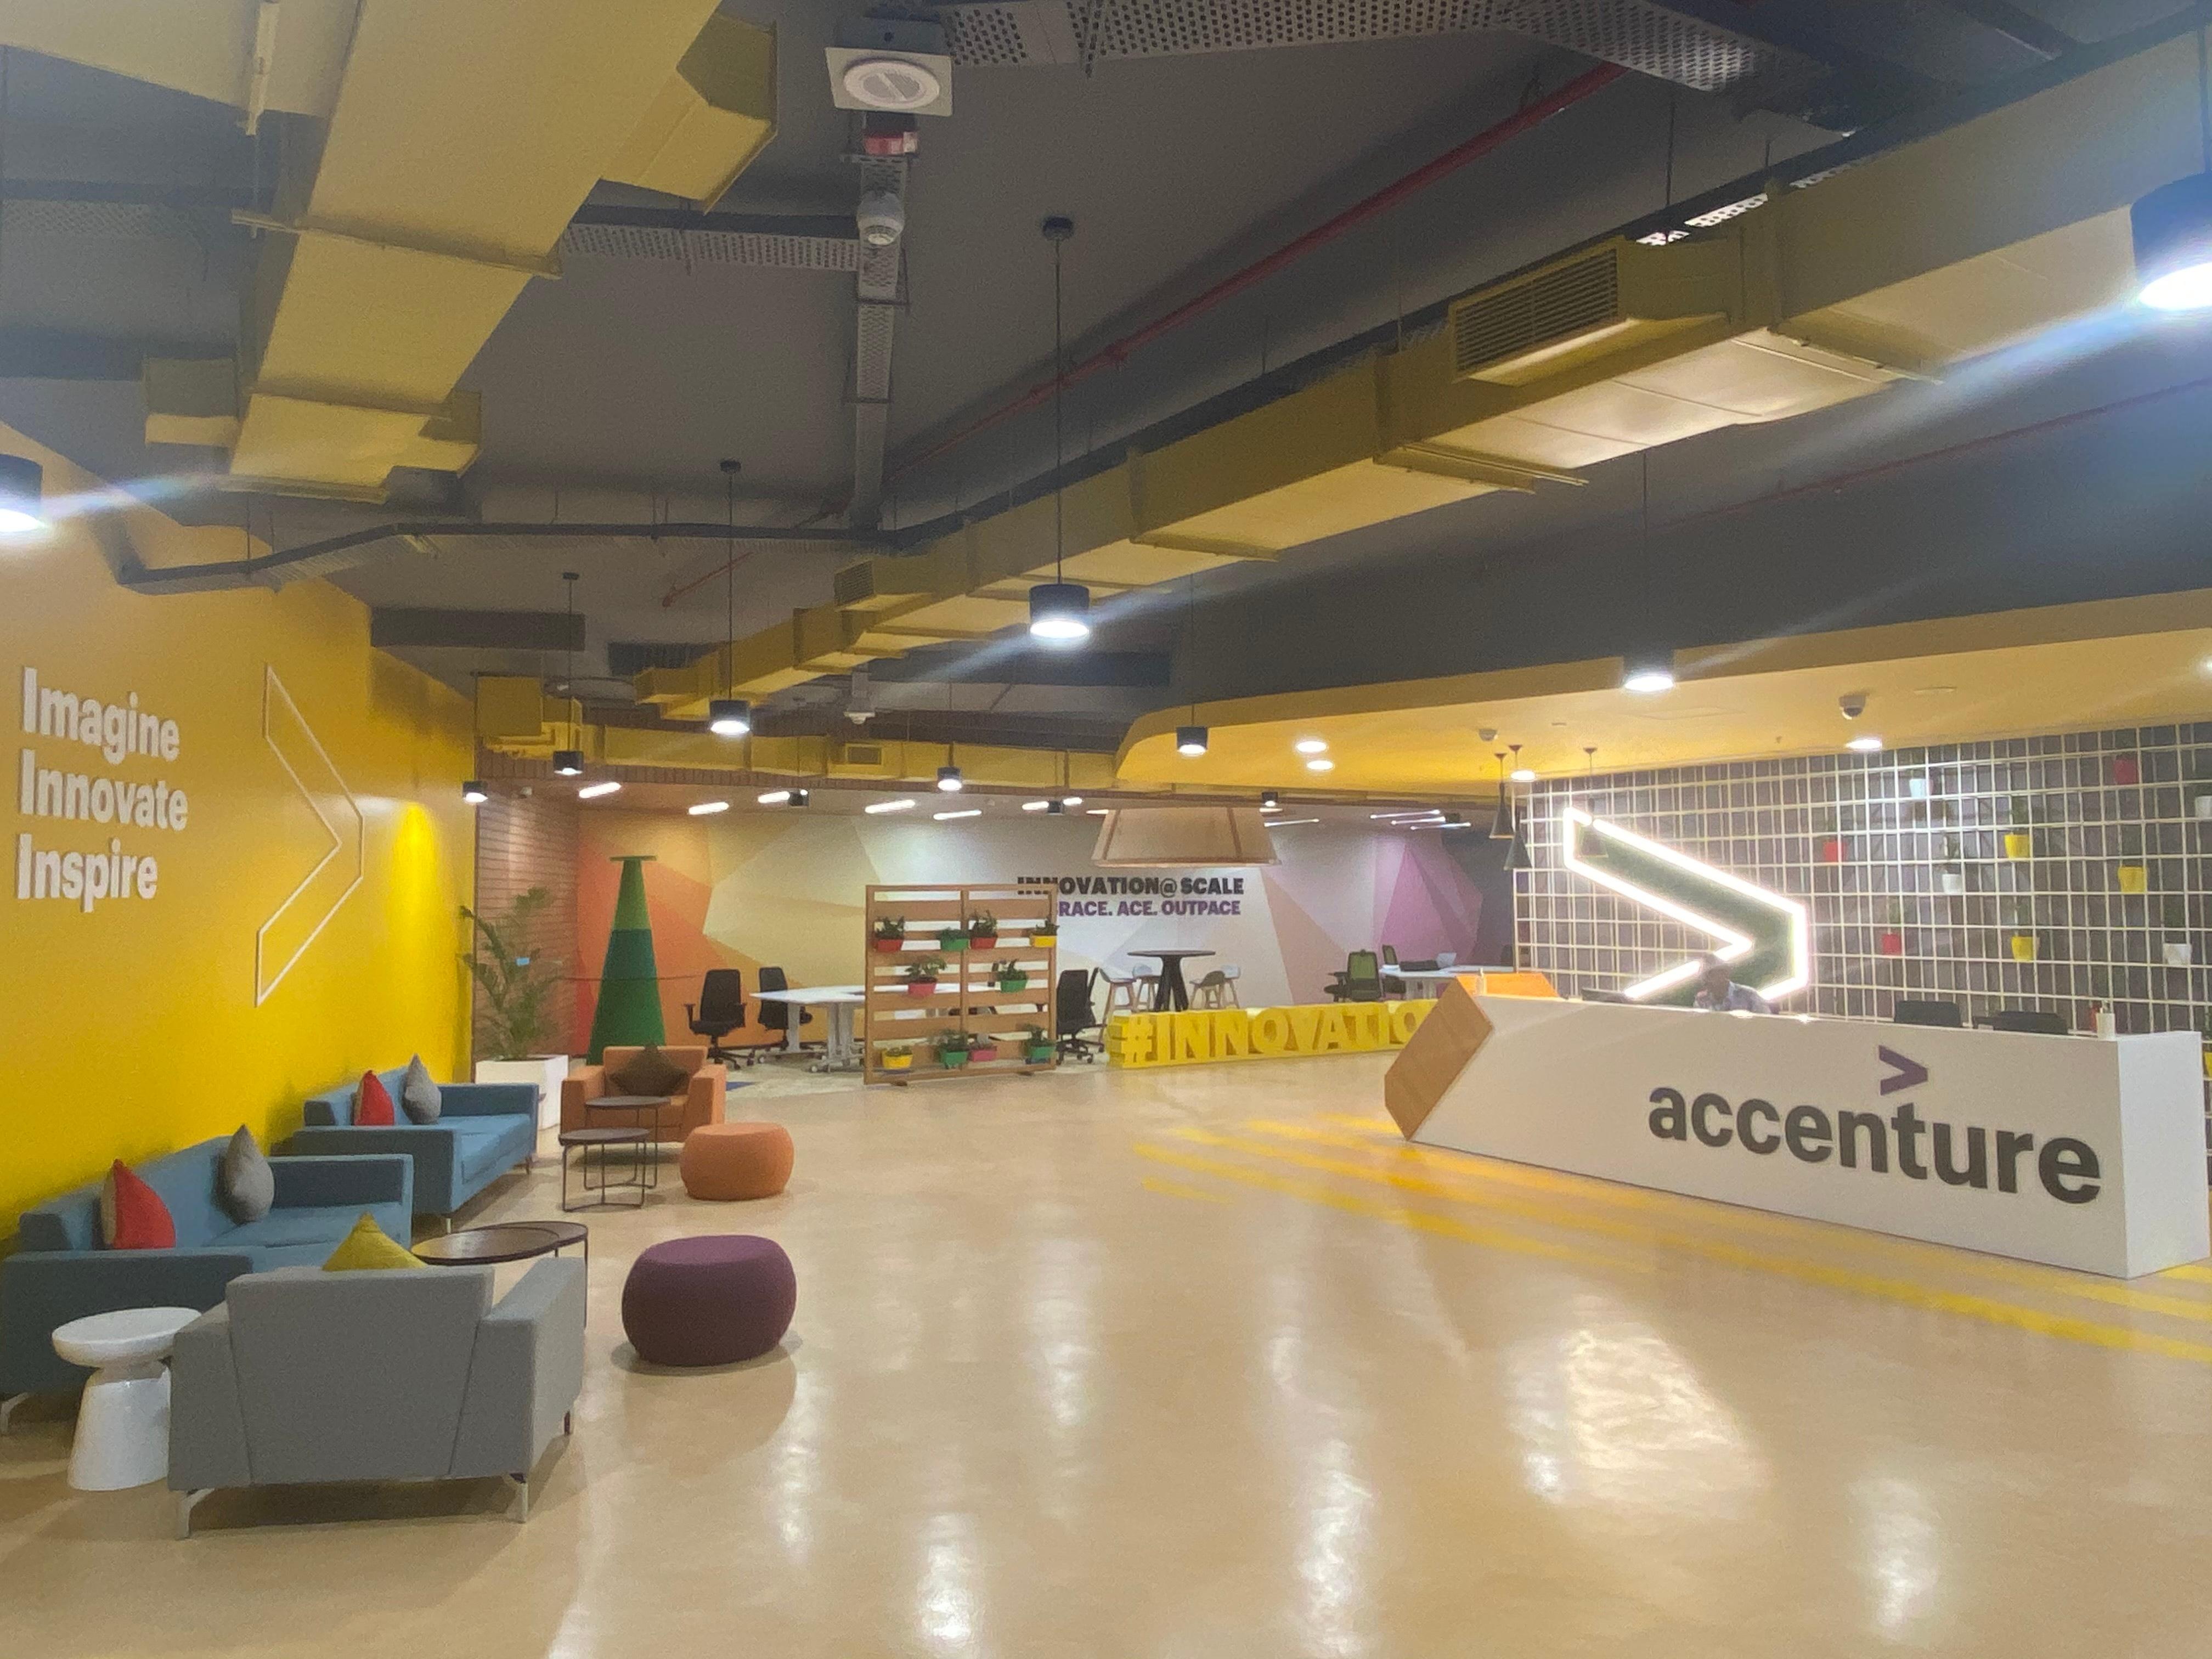 Accenture বিশ্বের অন্যতম বৃহত্ আইটি সংস্থা। ফাইল ছবি : অ্যাকসেঞ্চার (Accenture)